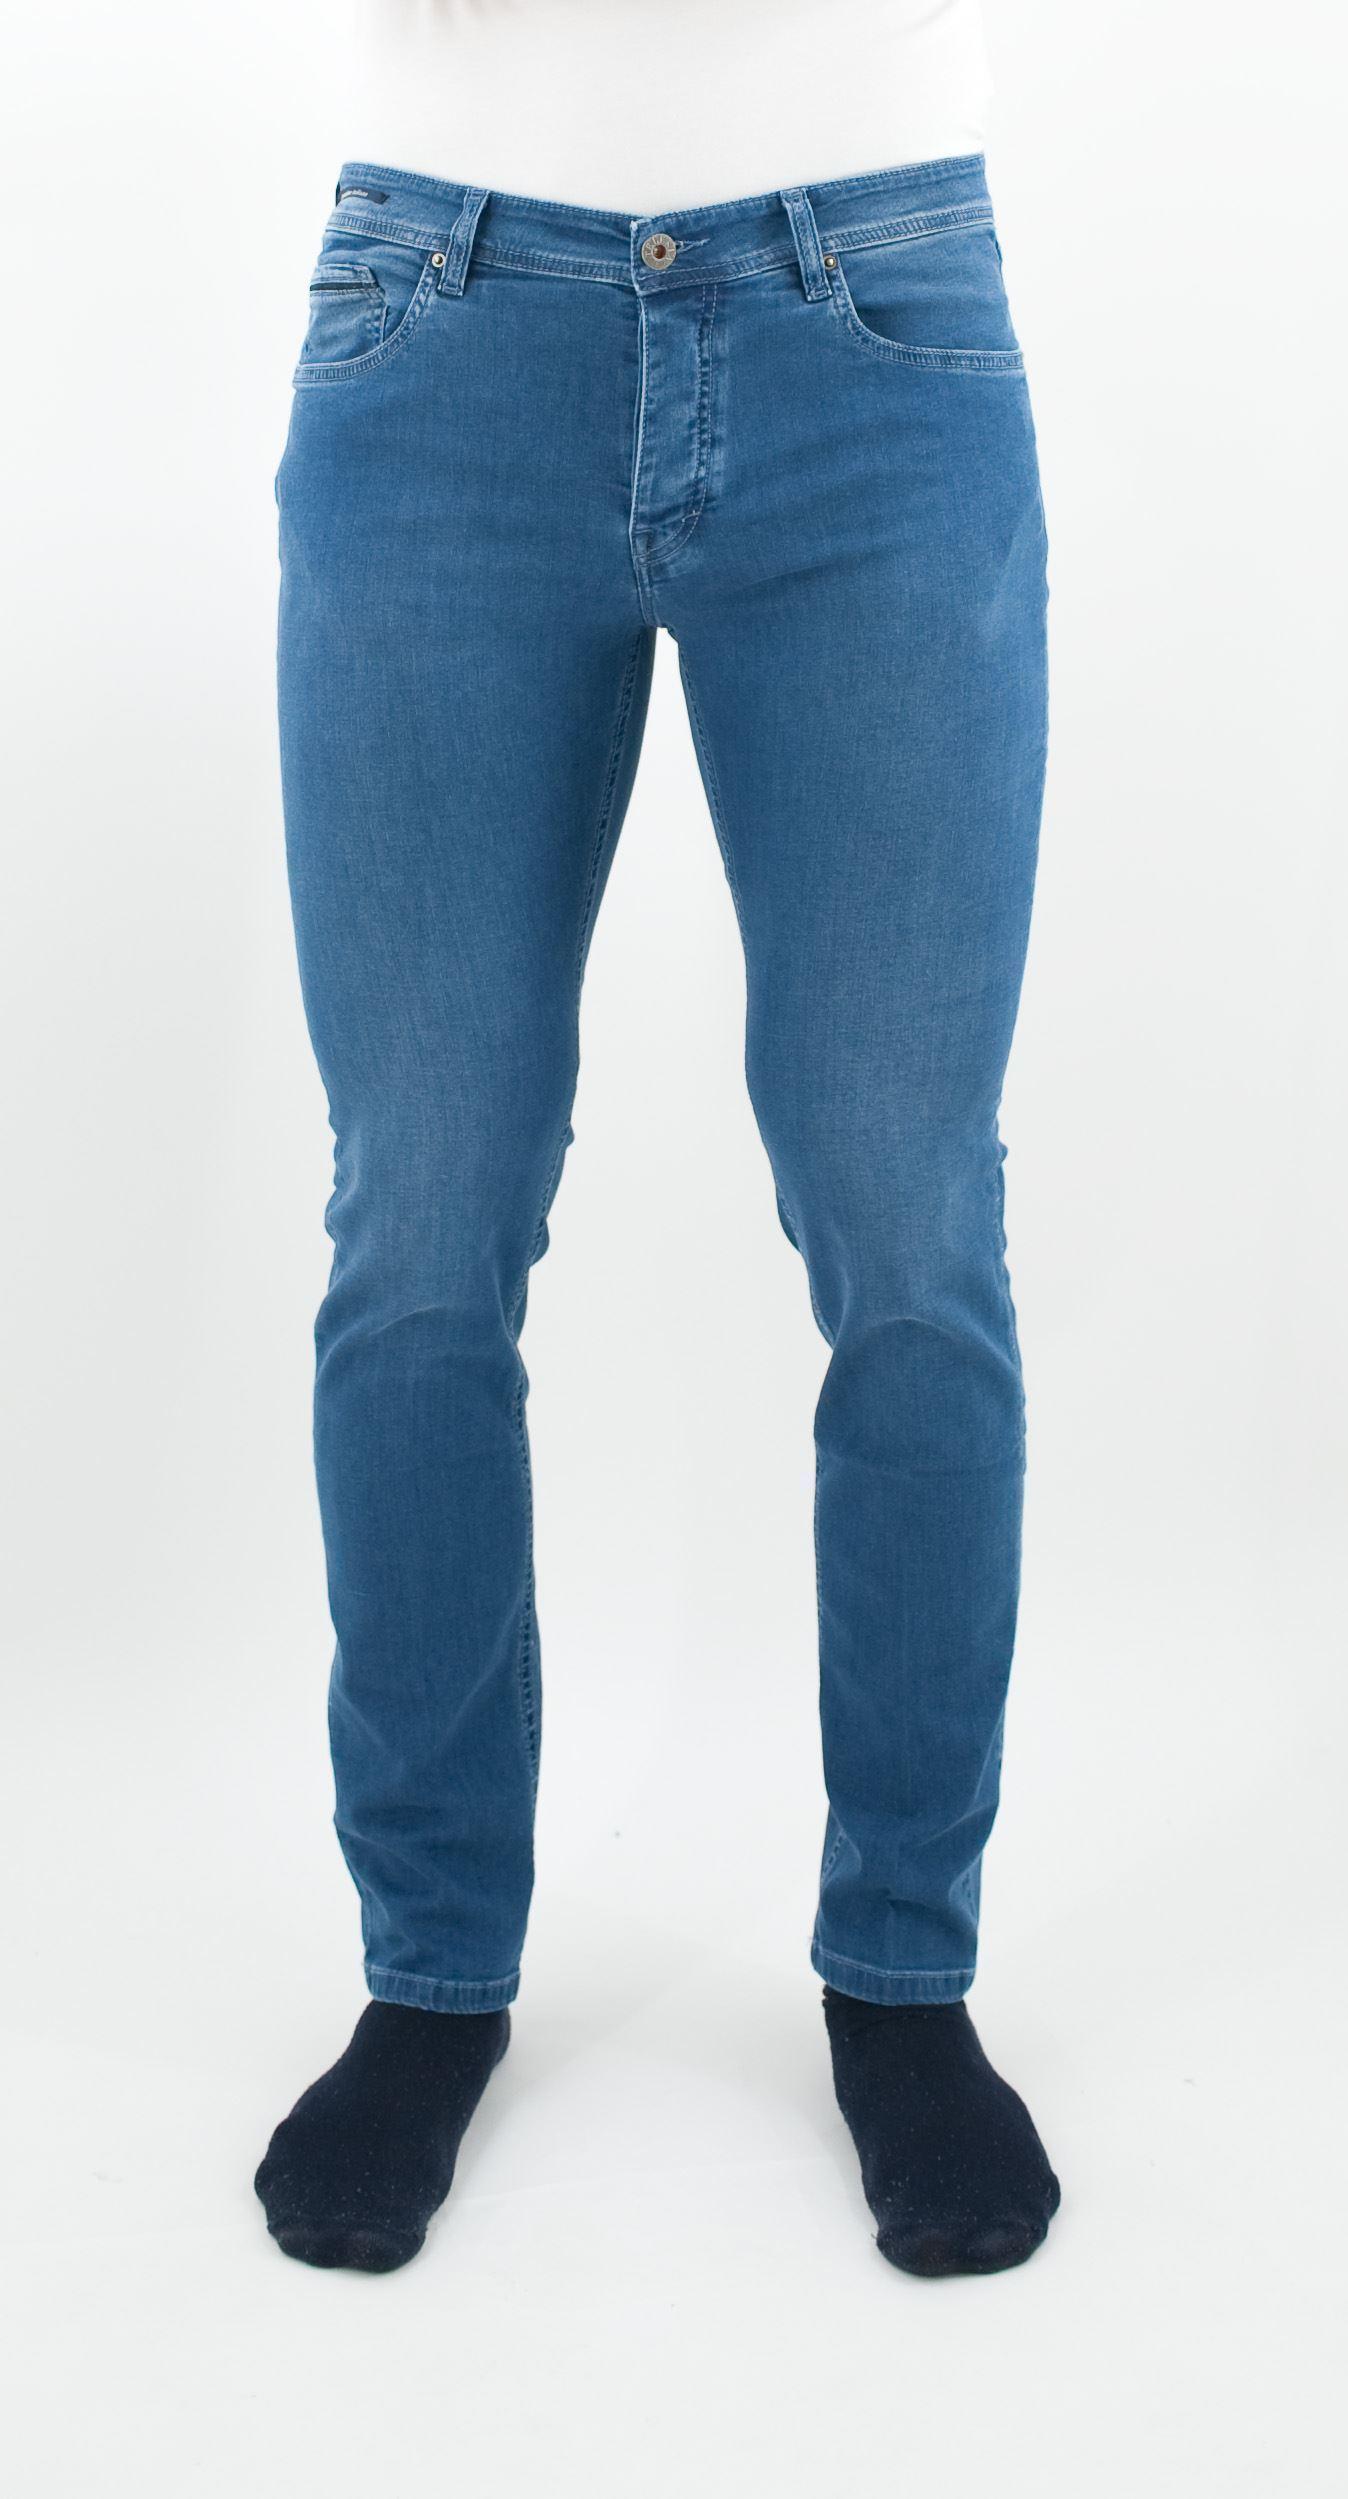 Picture of 5 pocket denim jeans